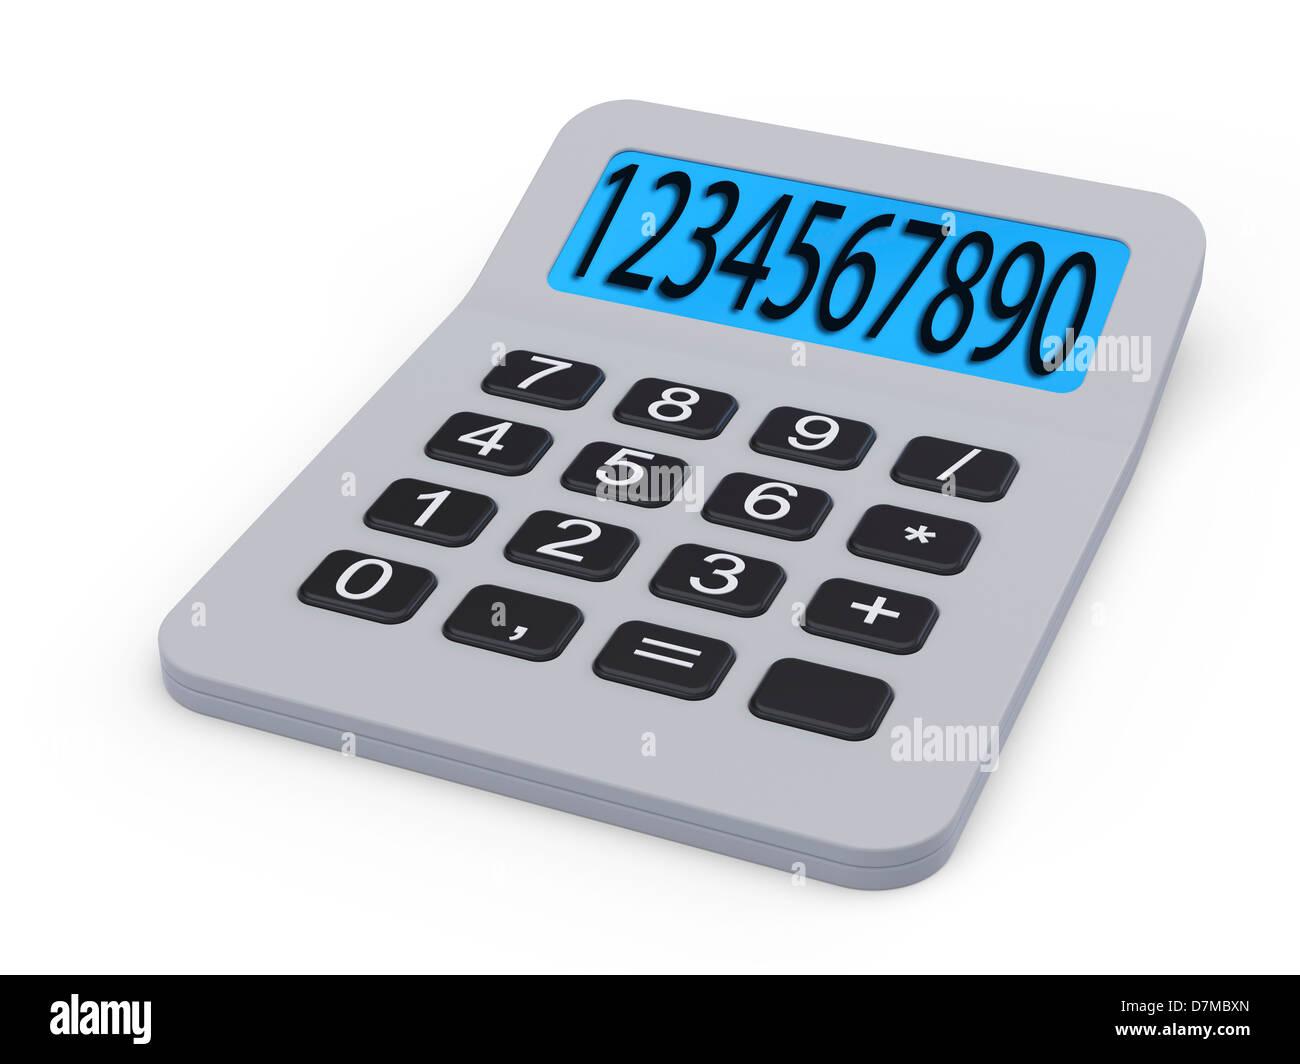 Calculator, artwork - Stock Image